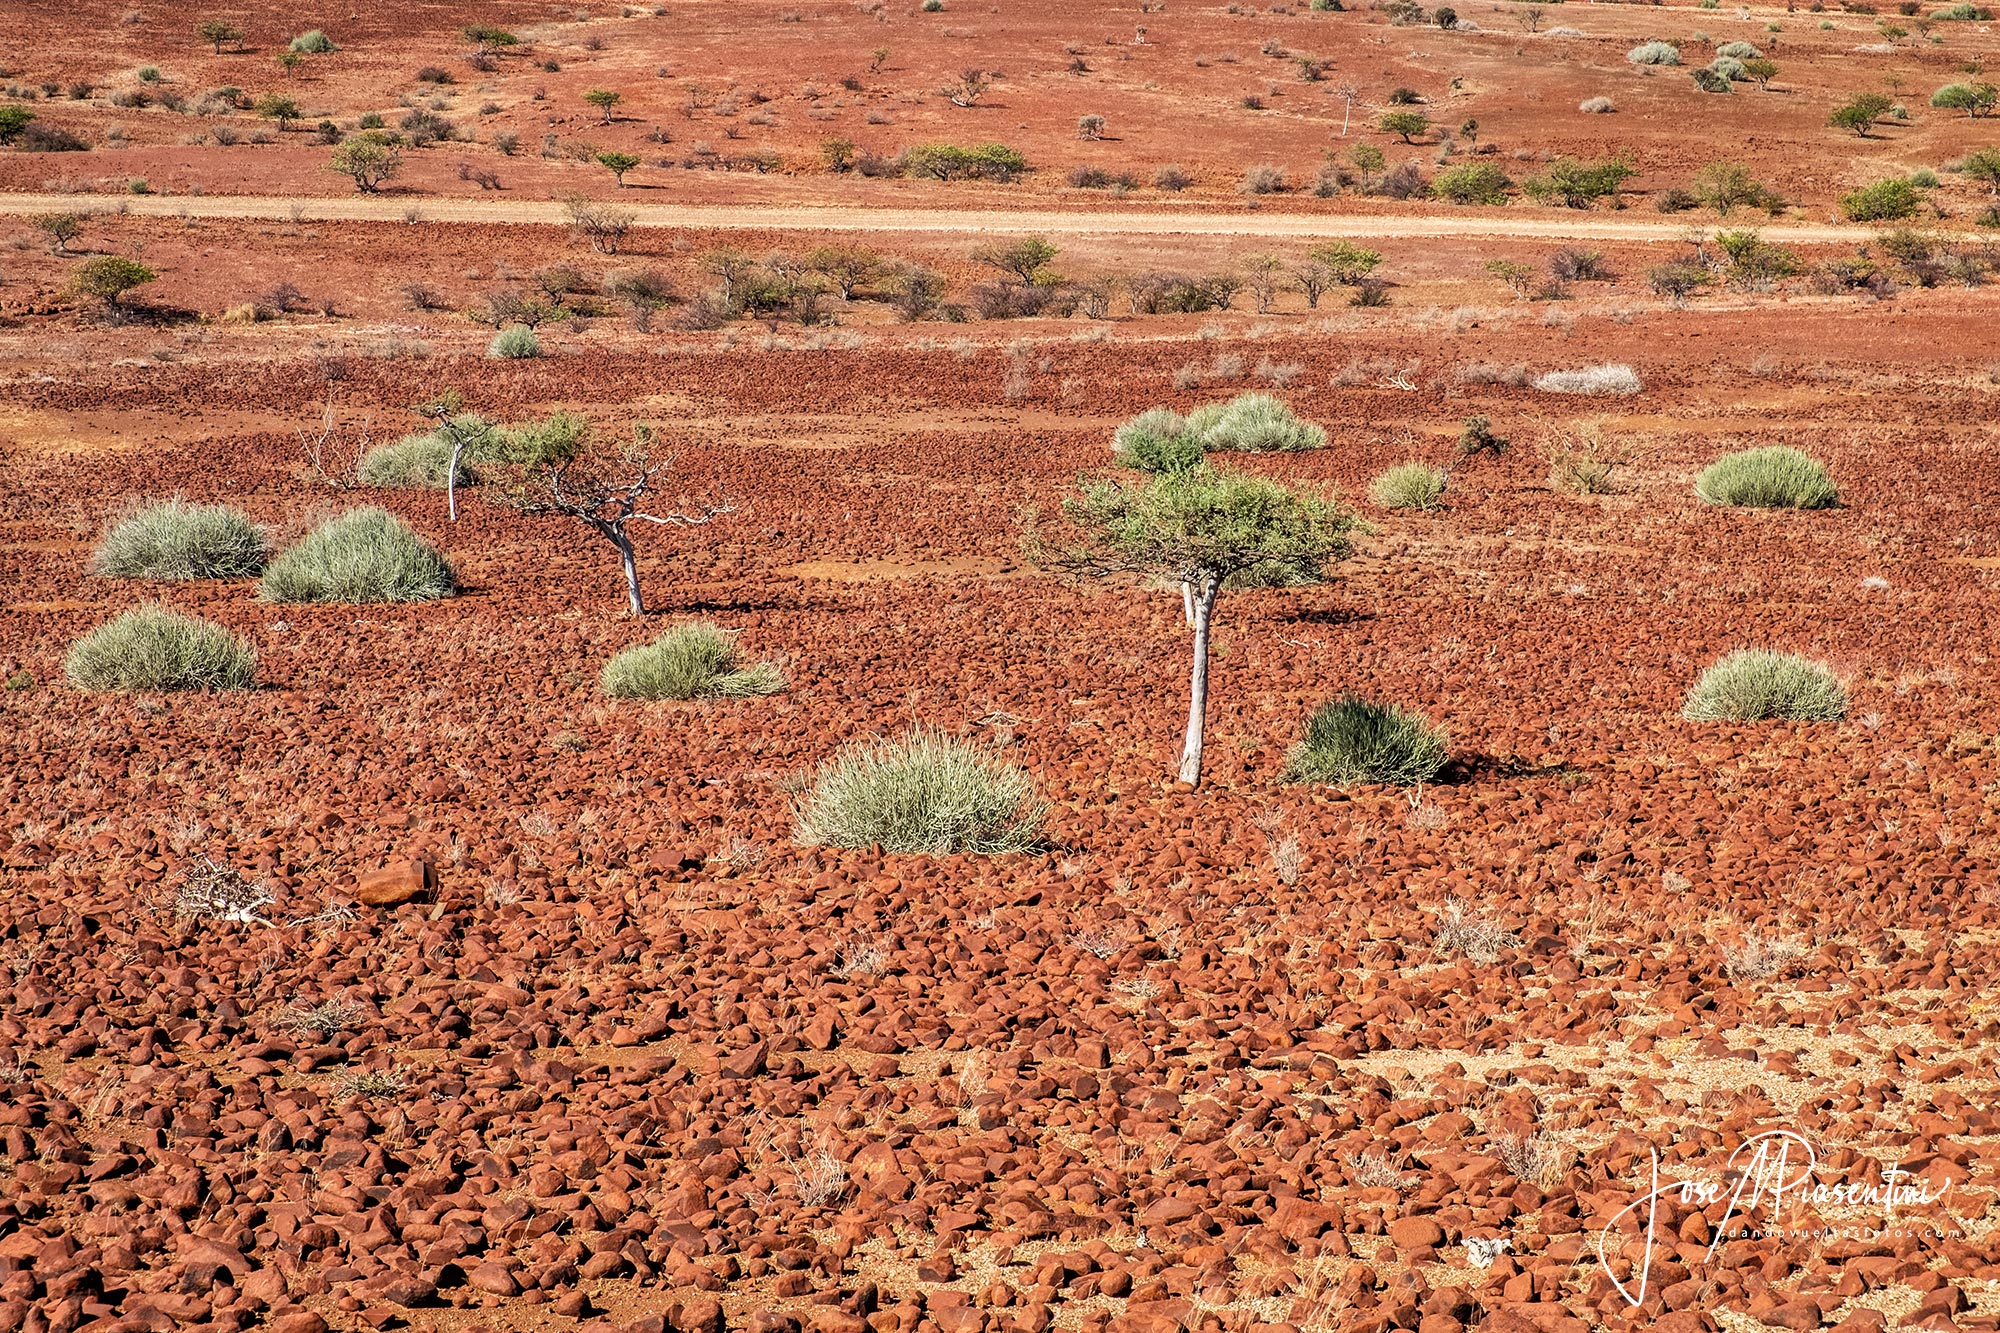 Damaraland-Camino-Twyfelfontein-Palmwag-Khowarib